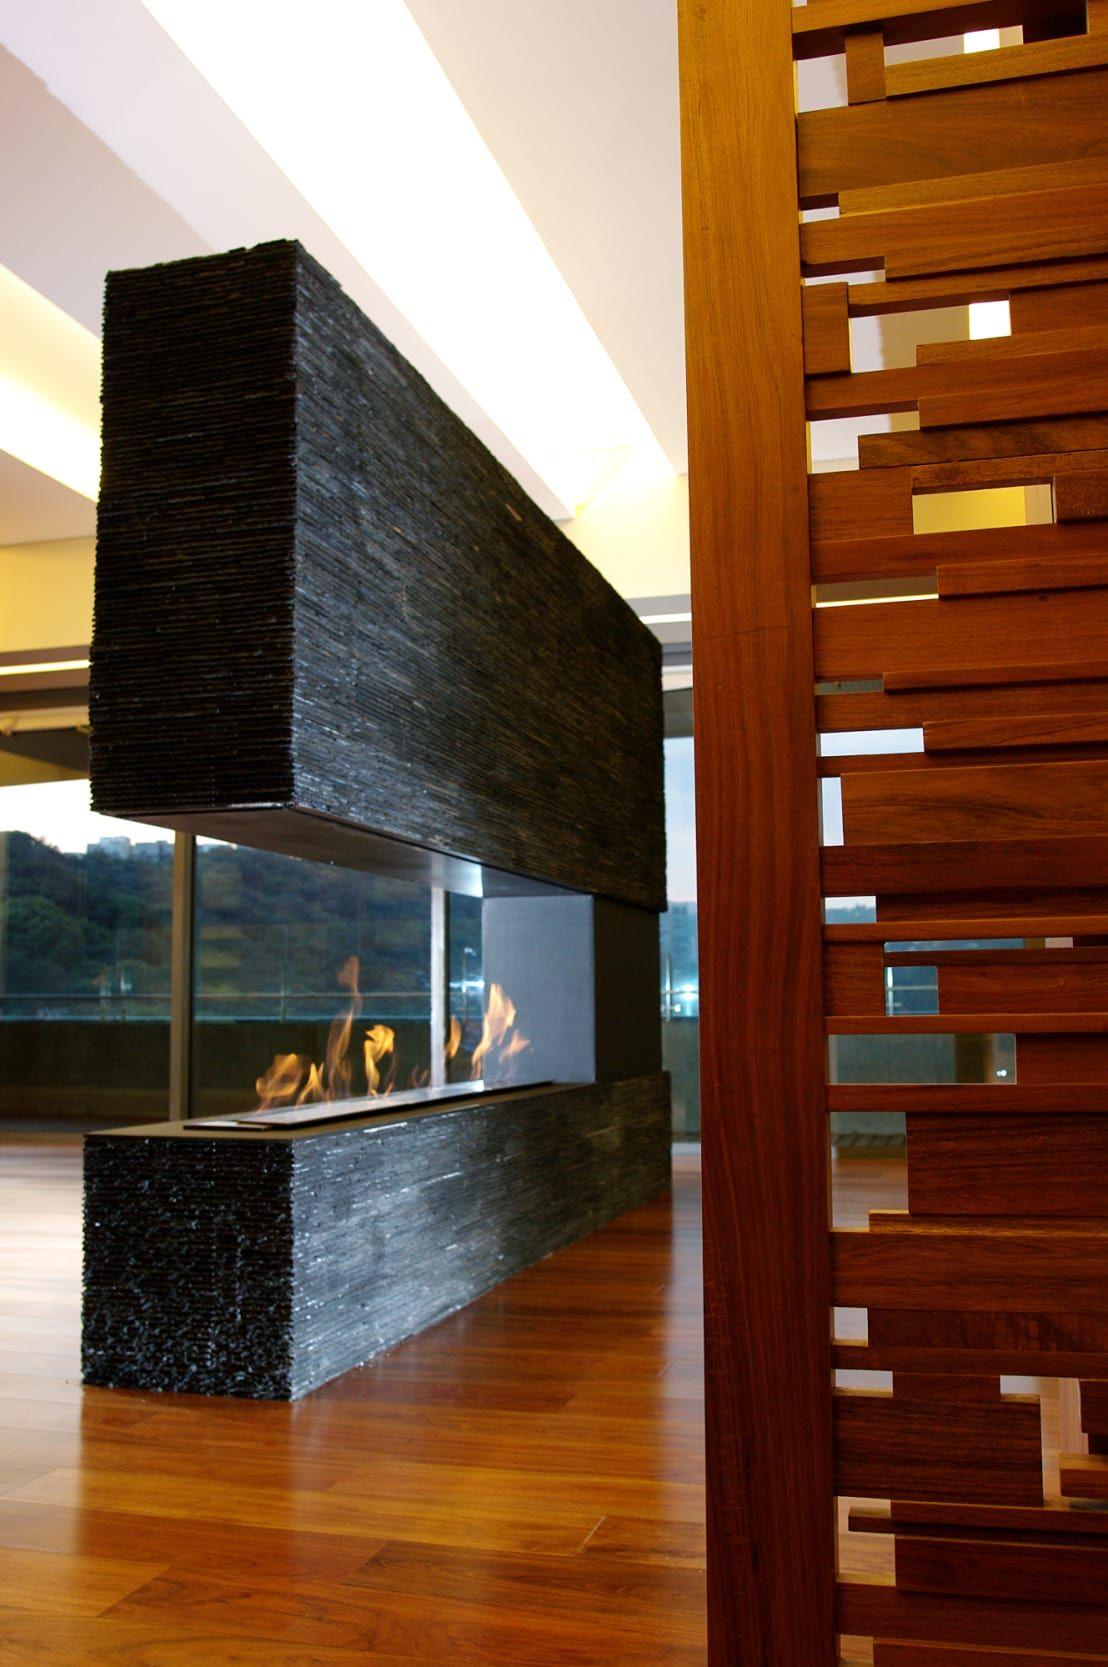 10 chimeneas modernas y espectaculares chimeneas - Chimeneas interiores ...